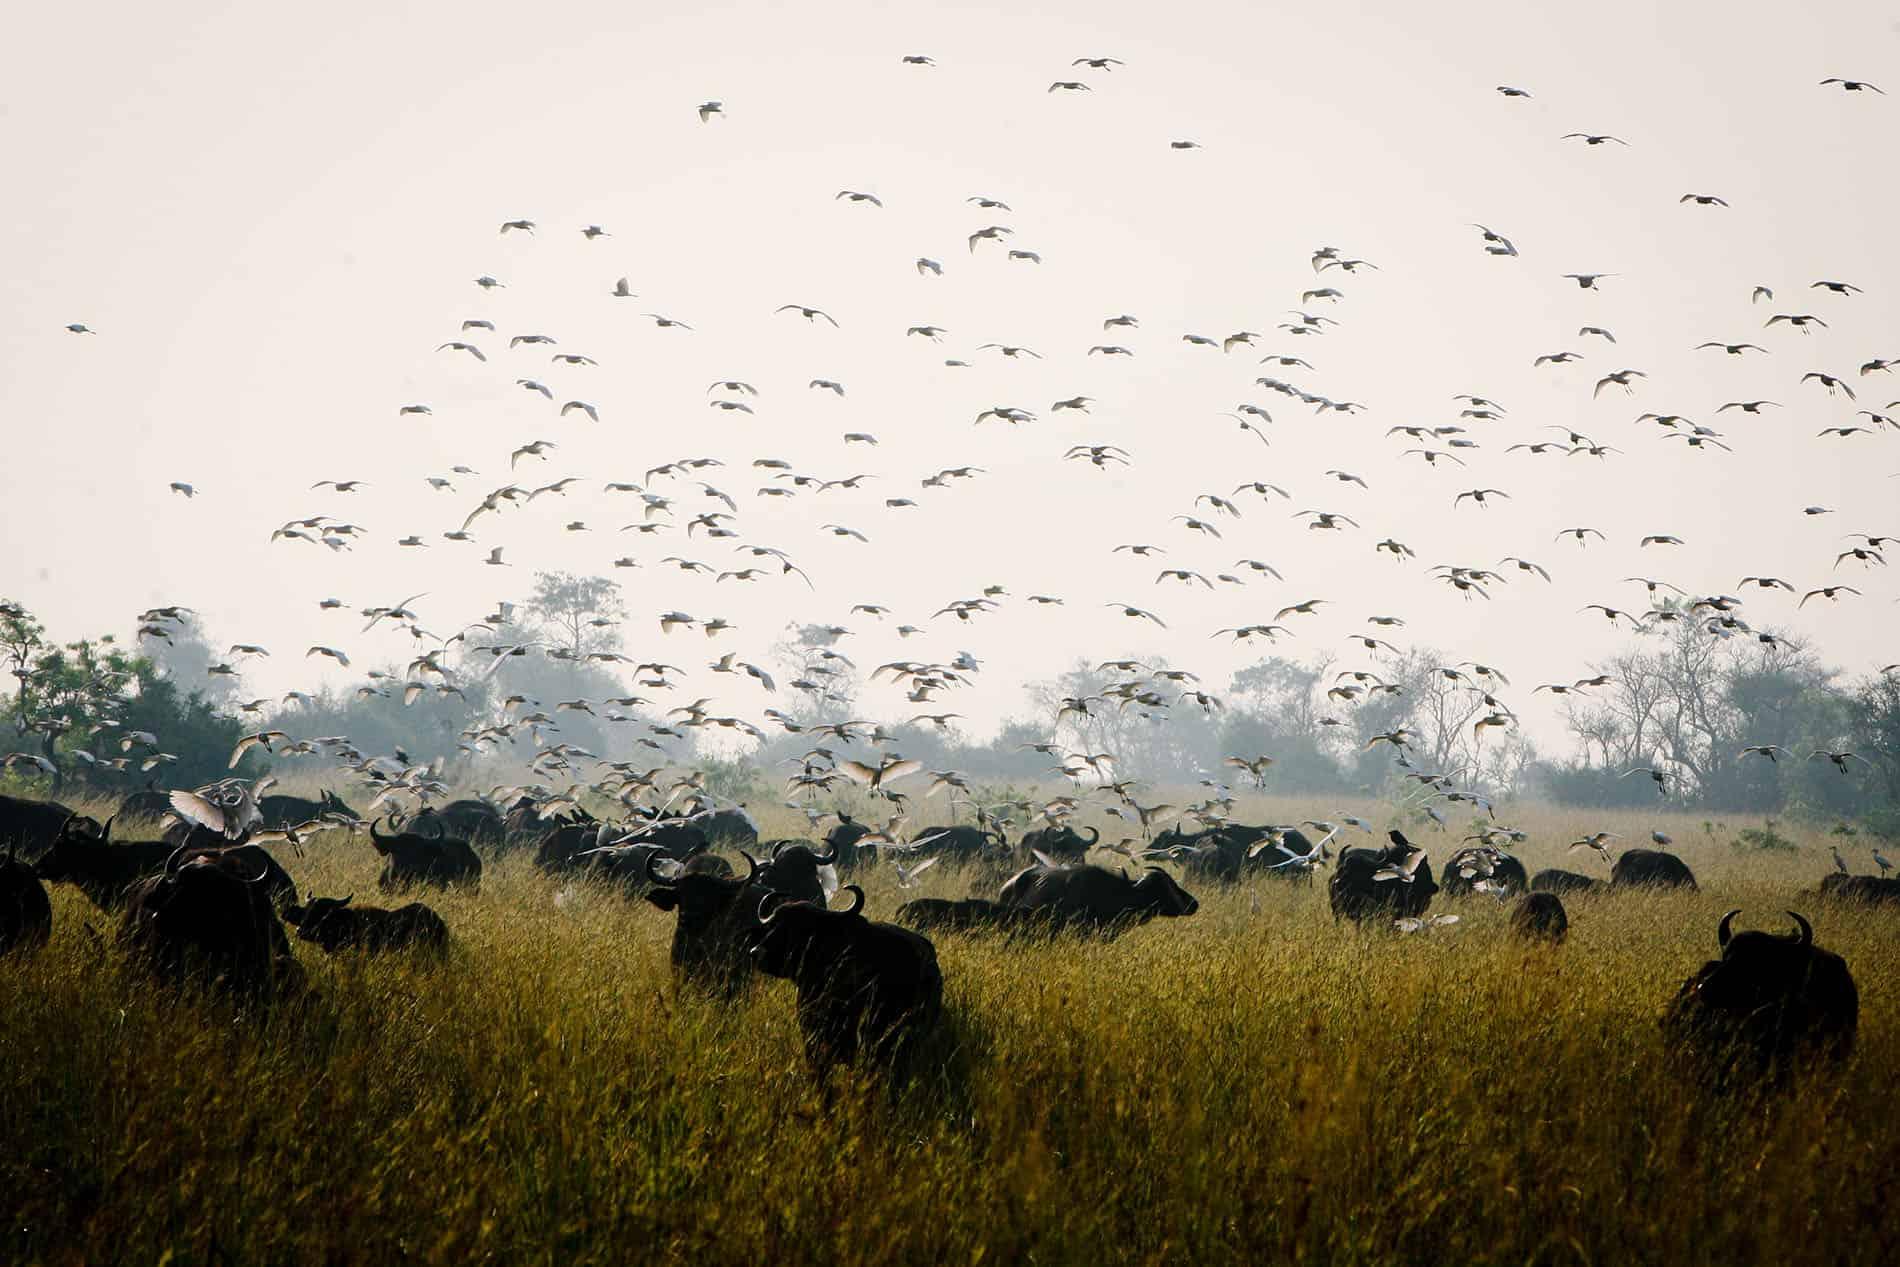 Majesty of Murchison Safari - Top Image